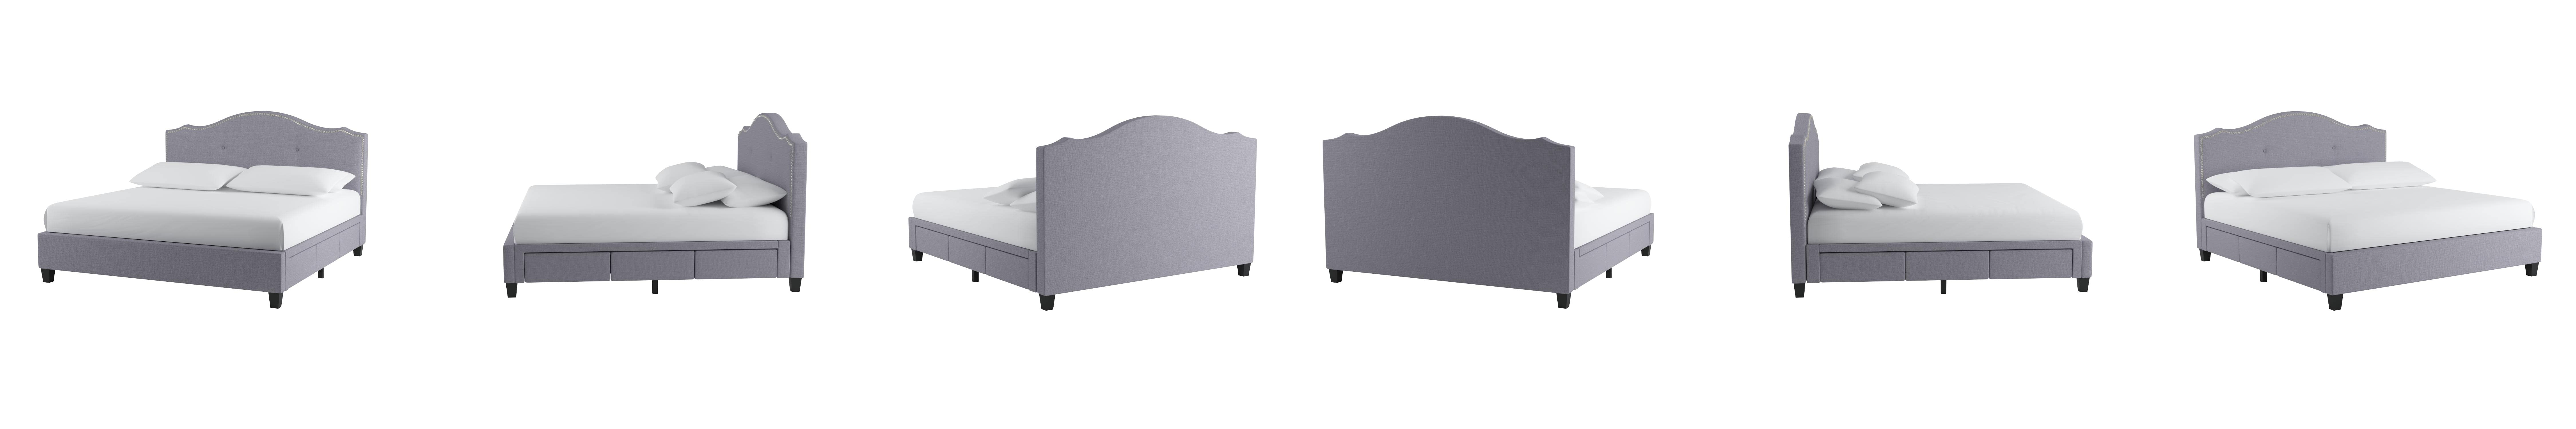 Amazoncom Baxton Studio Armeena Linen Modern Storage Bed With Upholstered